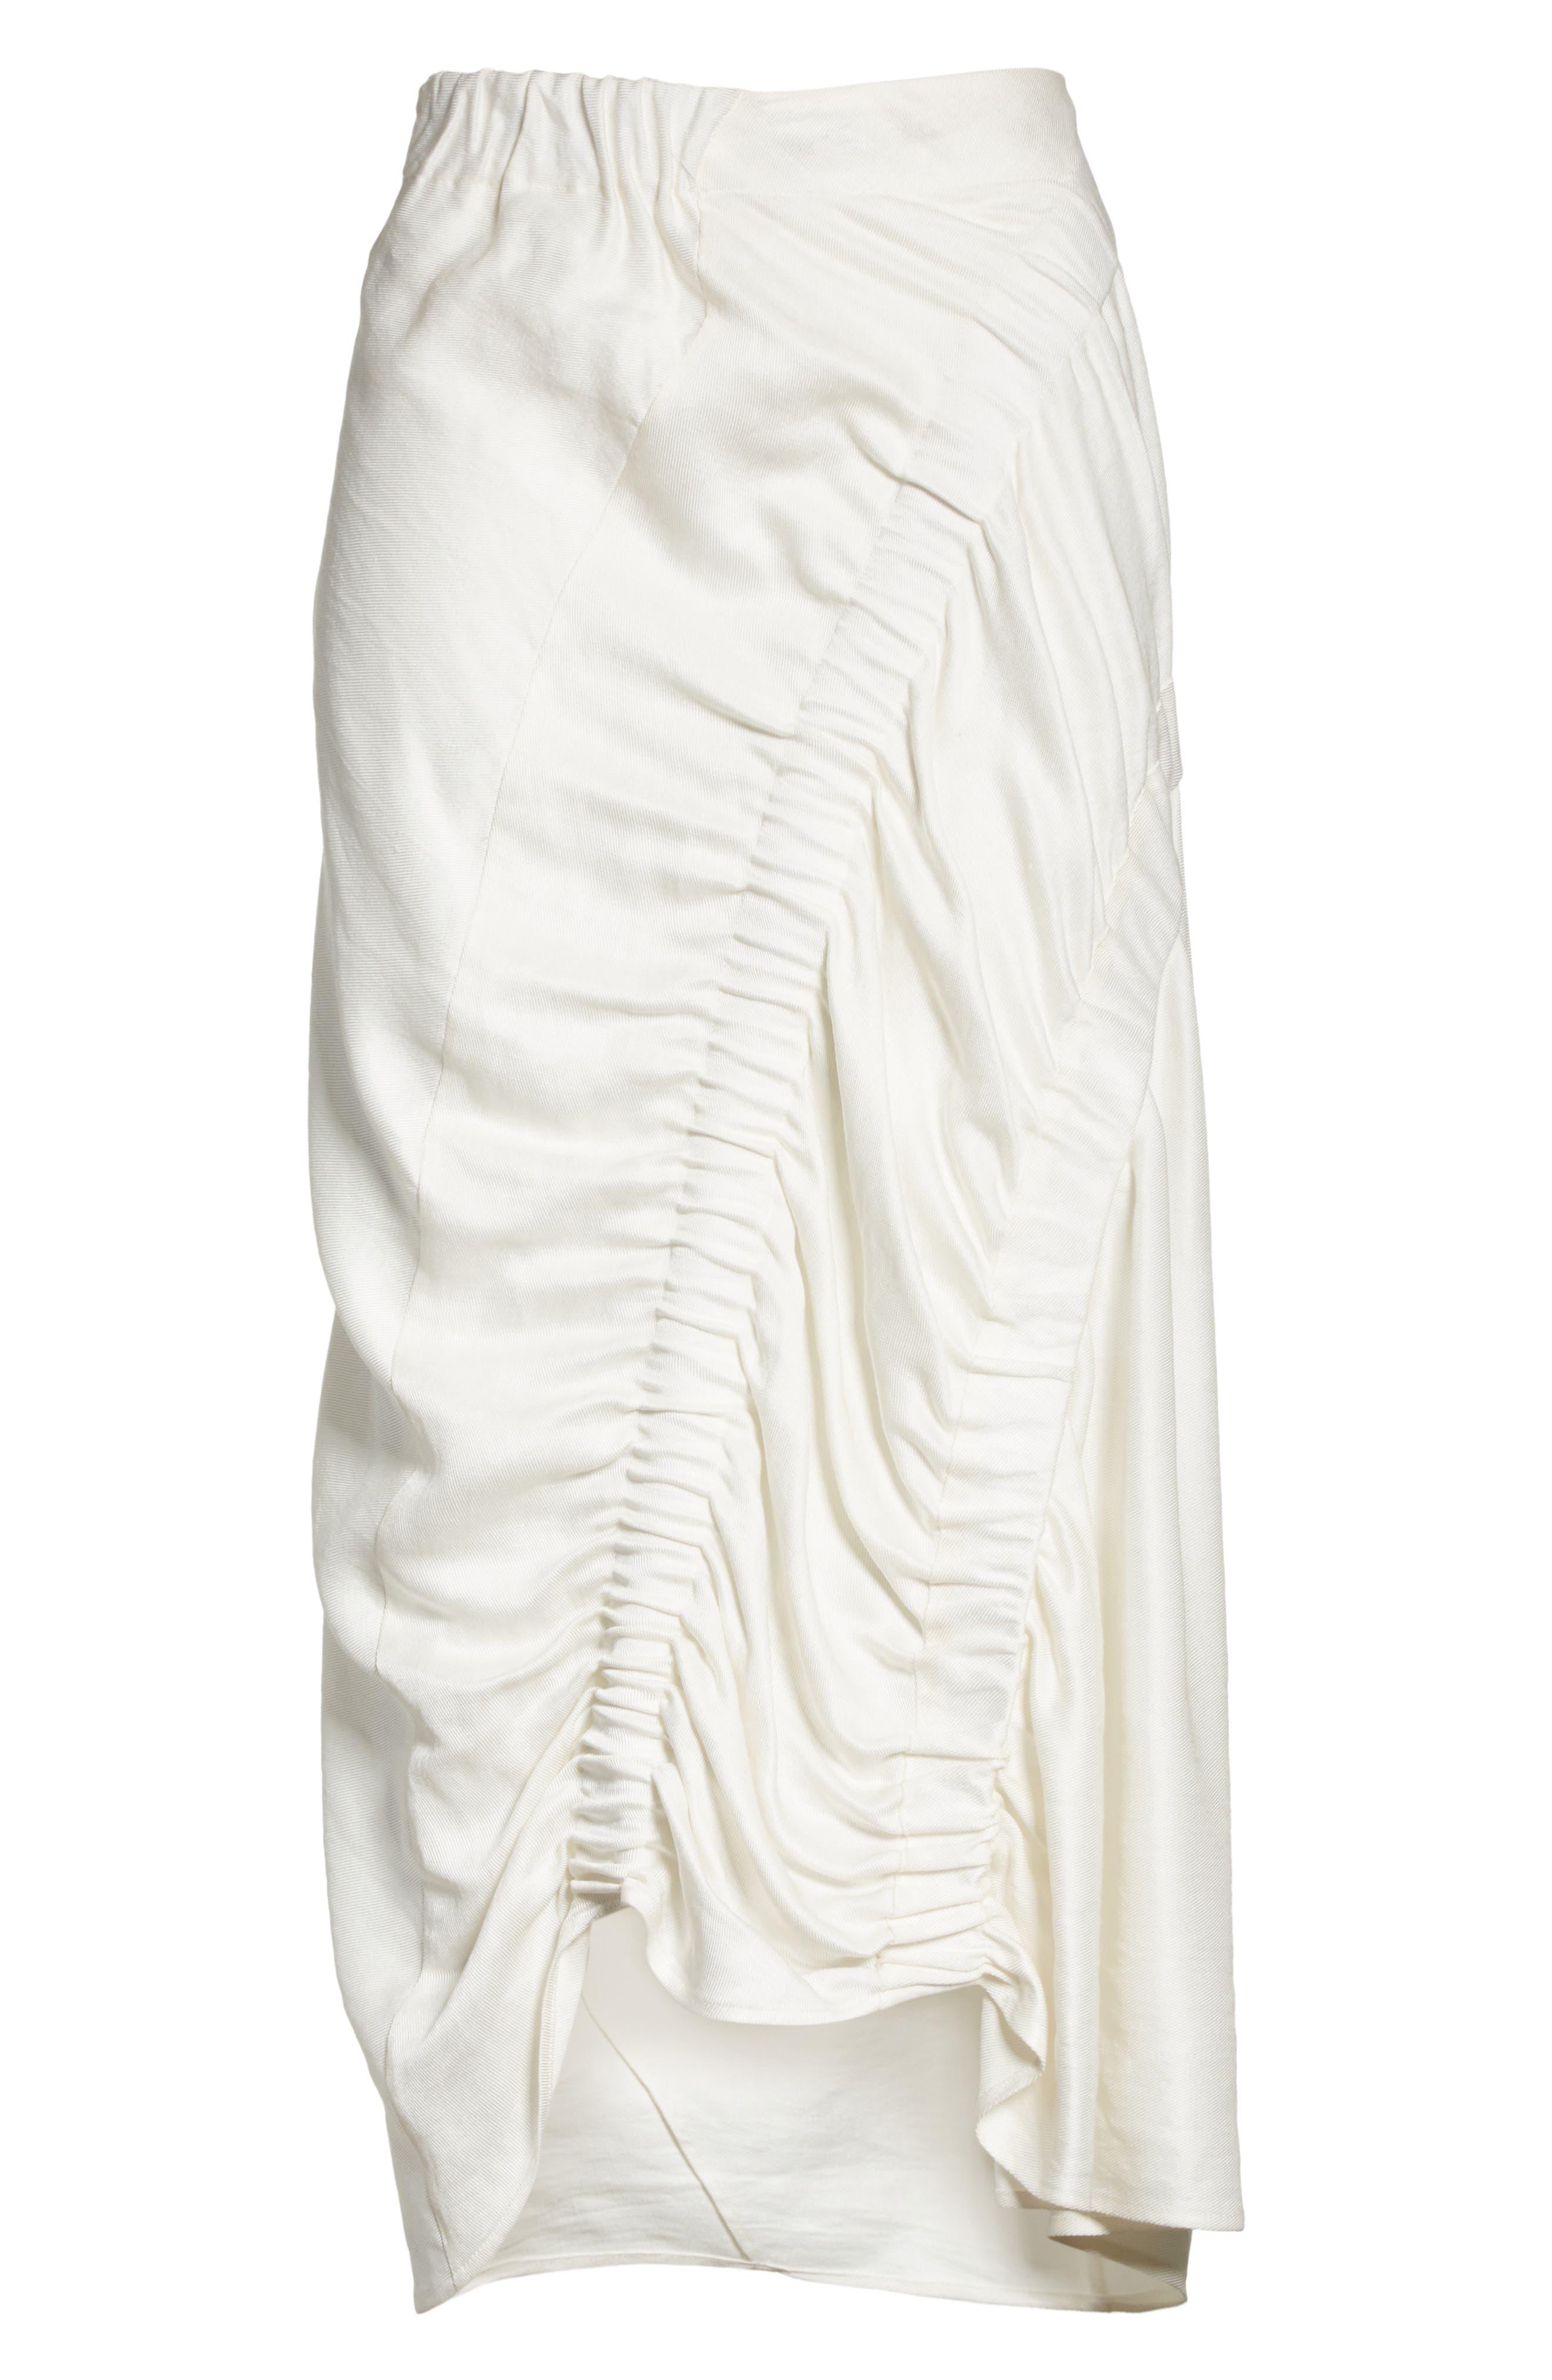 Ruched Drape Skirt,                             Alternate thumbnail 6, color,                             100